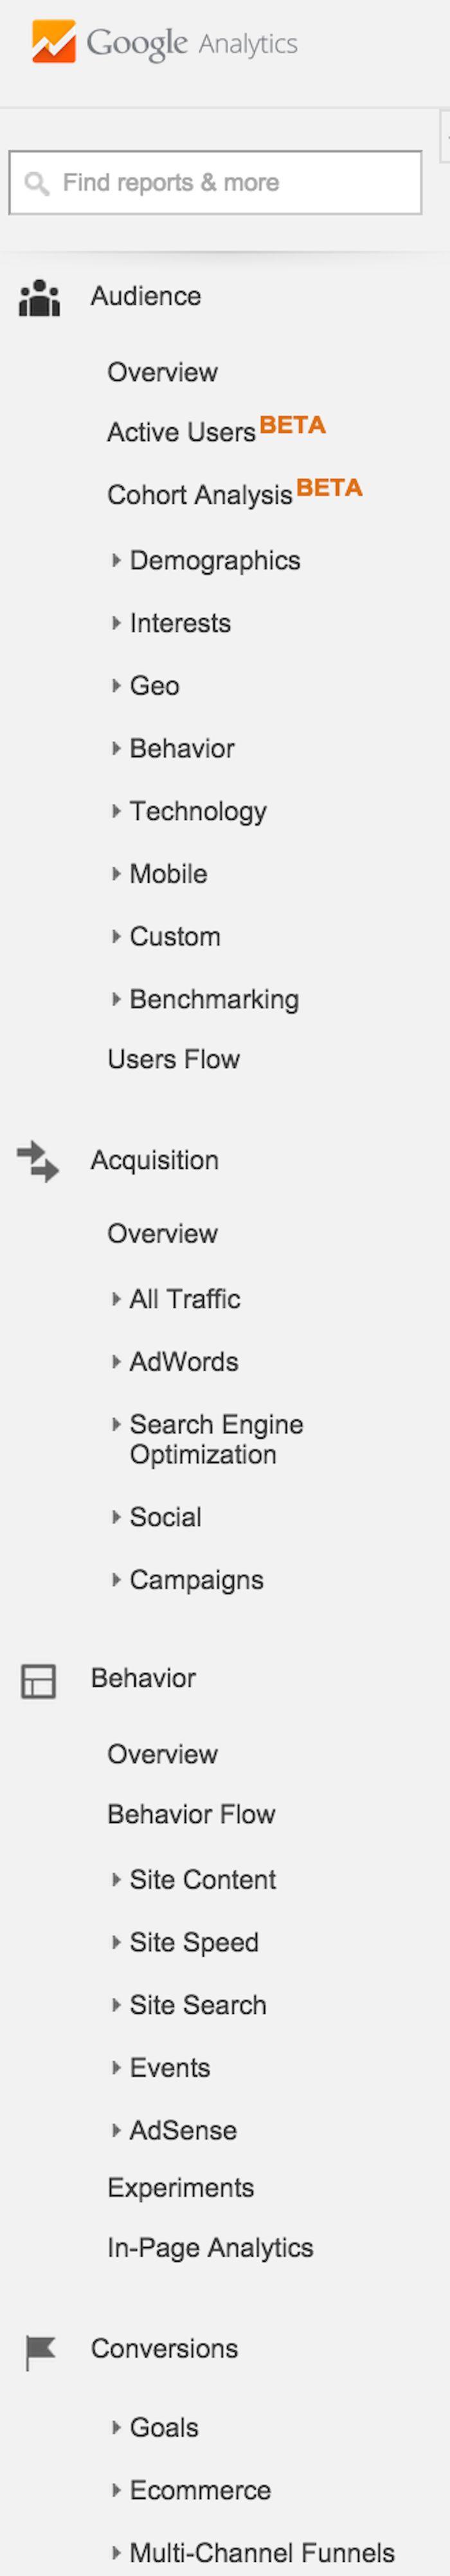 types of google analytics reports